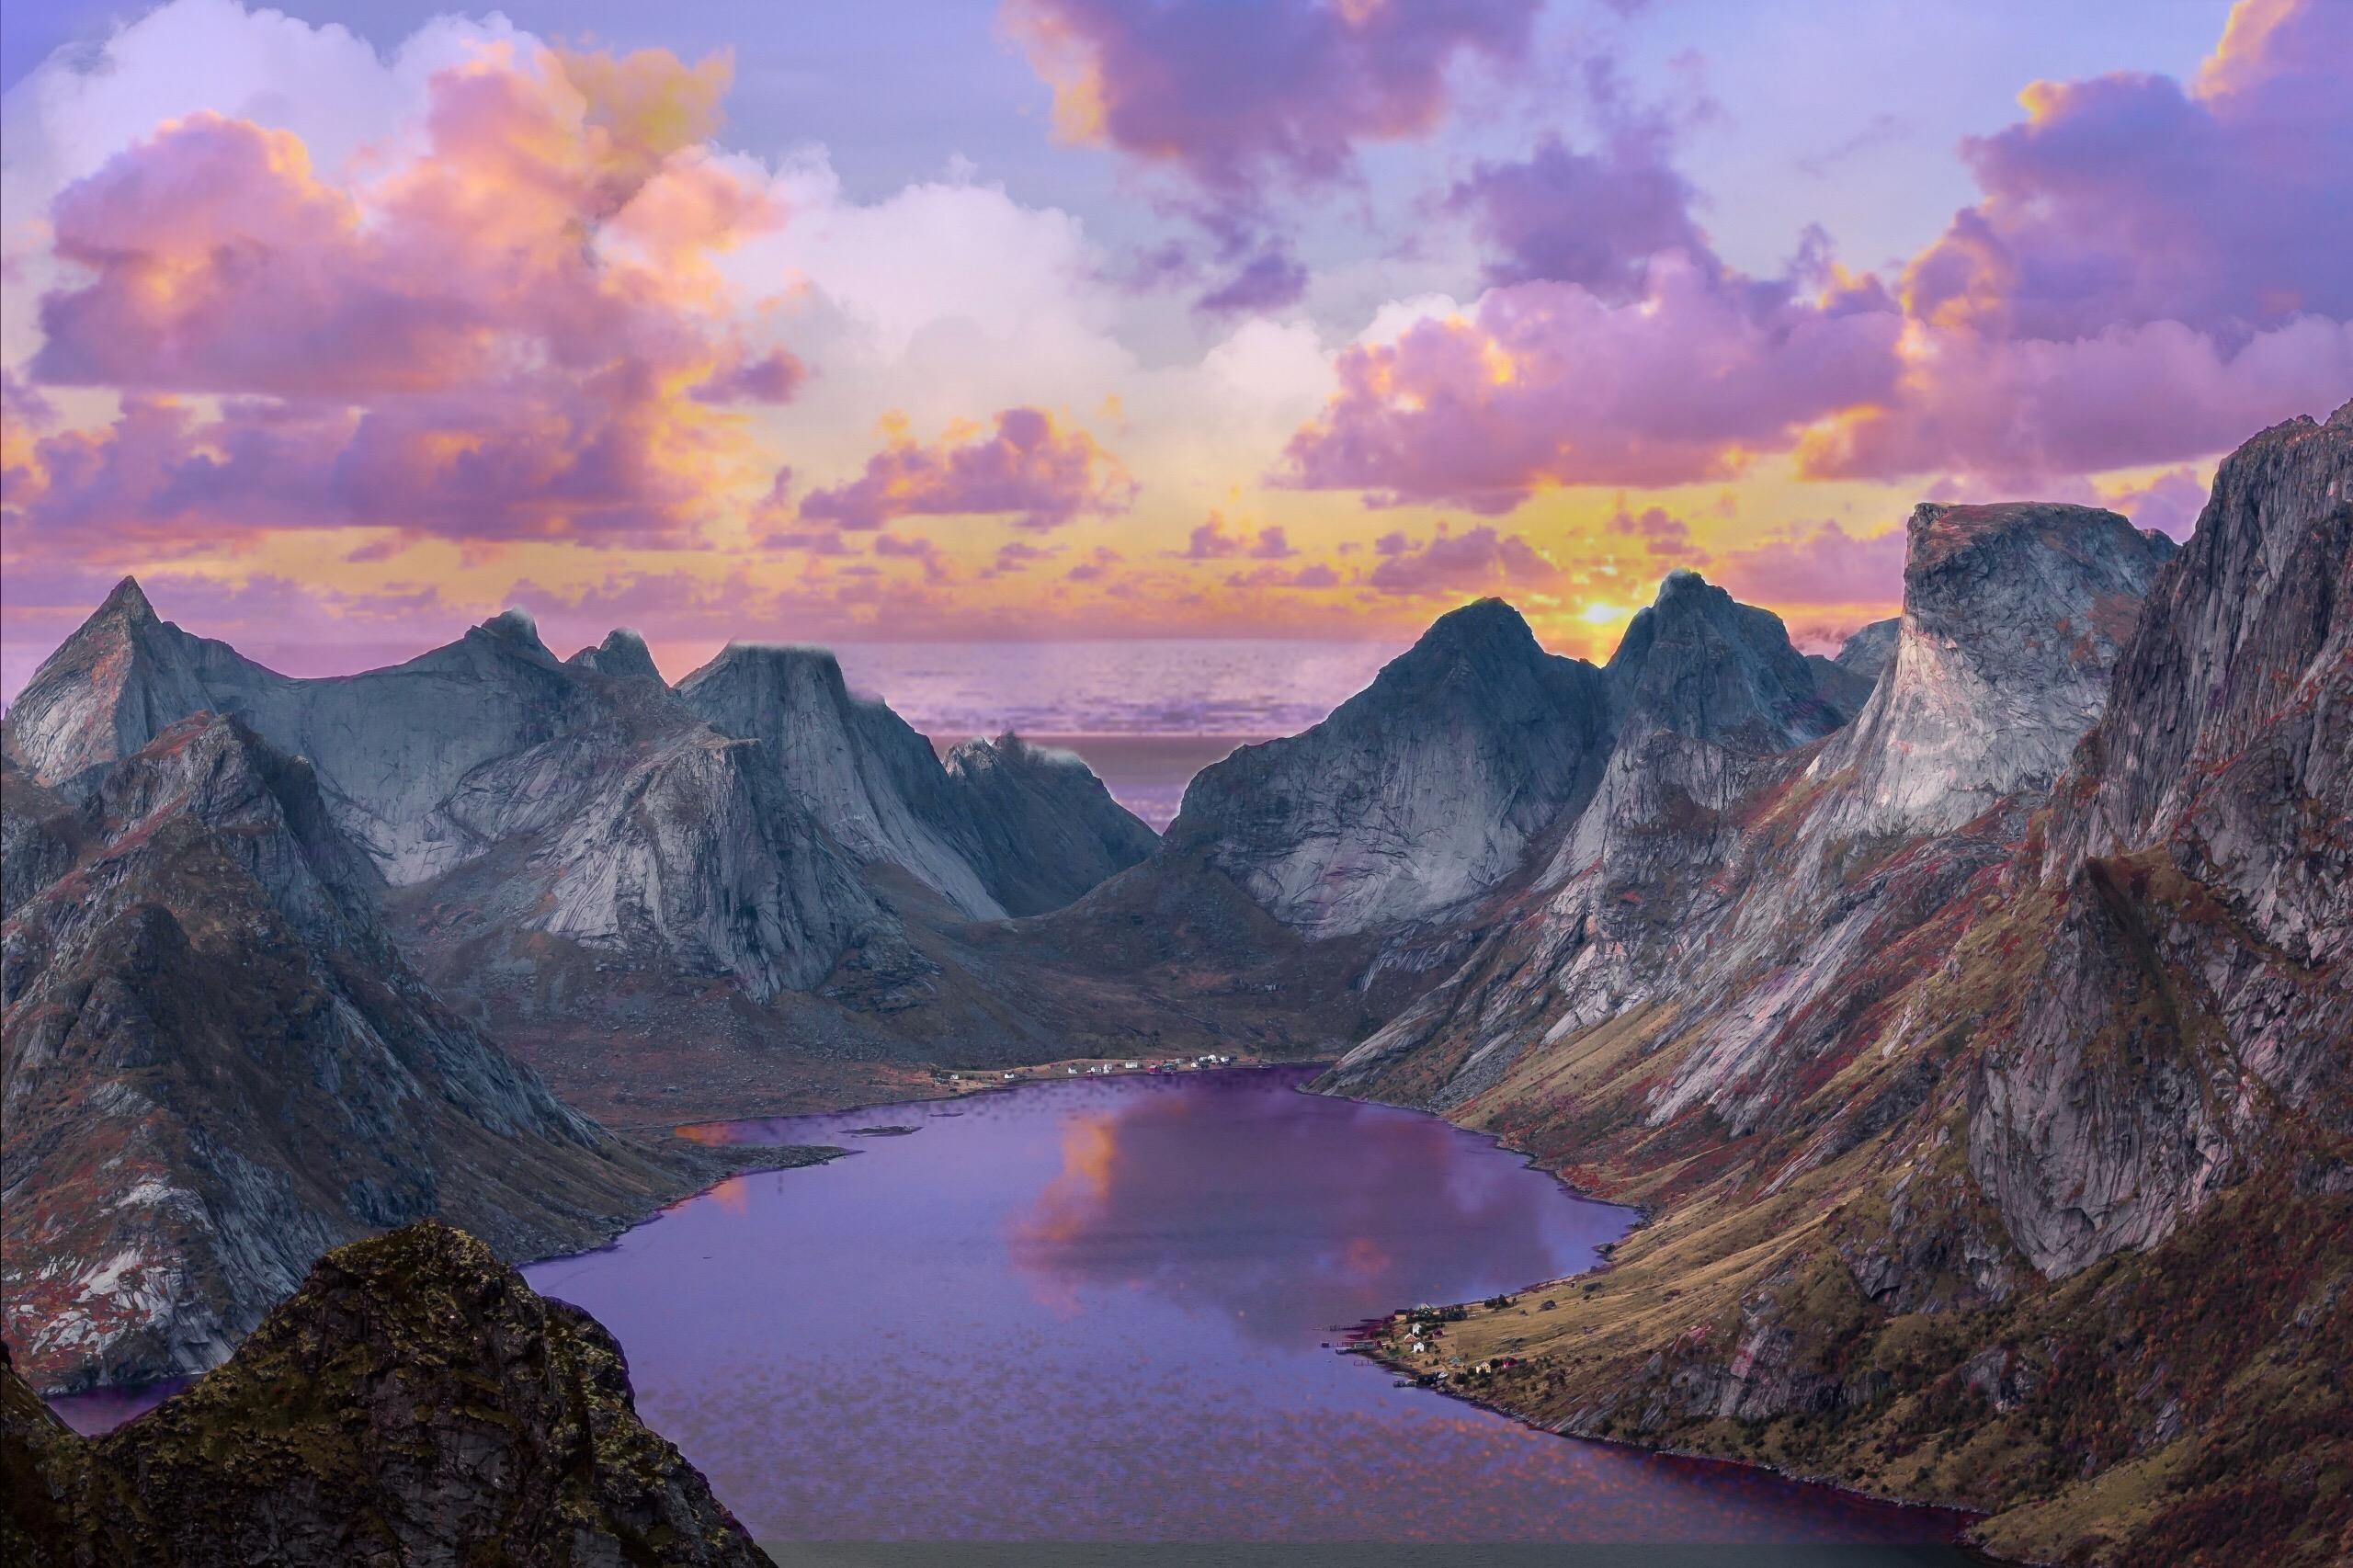 #freetoedit #iaminthischallenge #purple #sunset #sun #cloud #clouds #mountains #water #beautiful #voteforvote